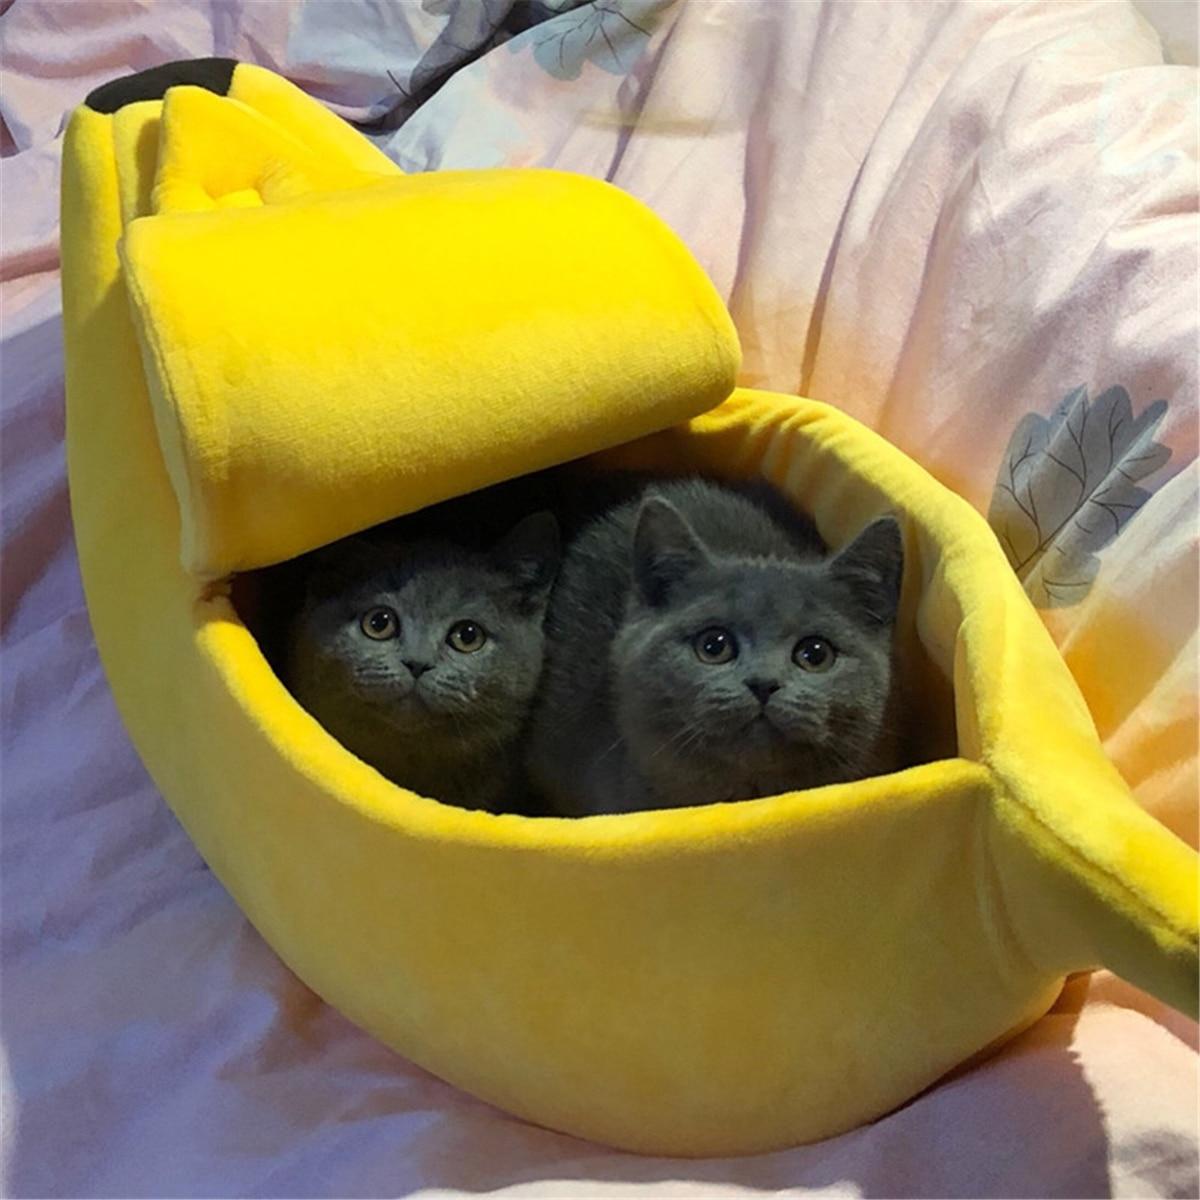 Banana Form Pet Hund Katze Bett Haus Matte Durable Kennel Doggy Puppy Kissen Korb Warme Tragbare Hund Katze Liefert S /M/L/XL